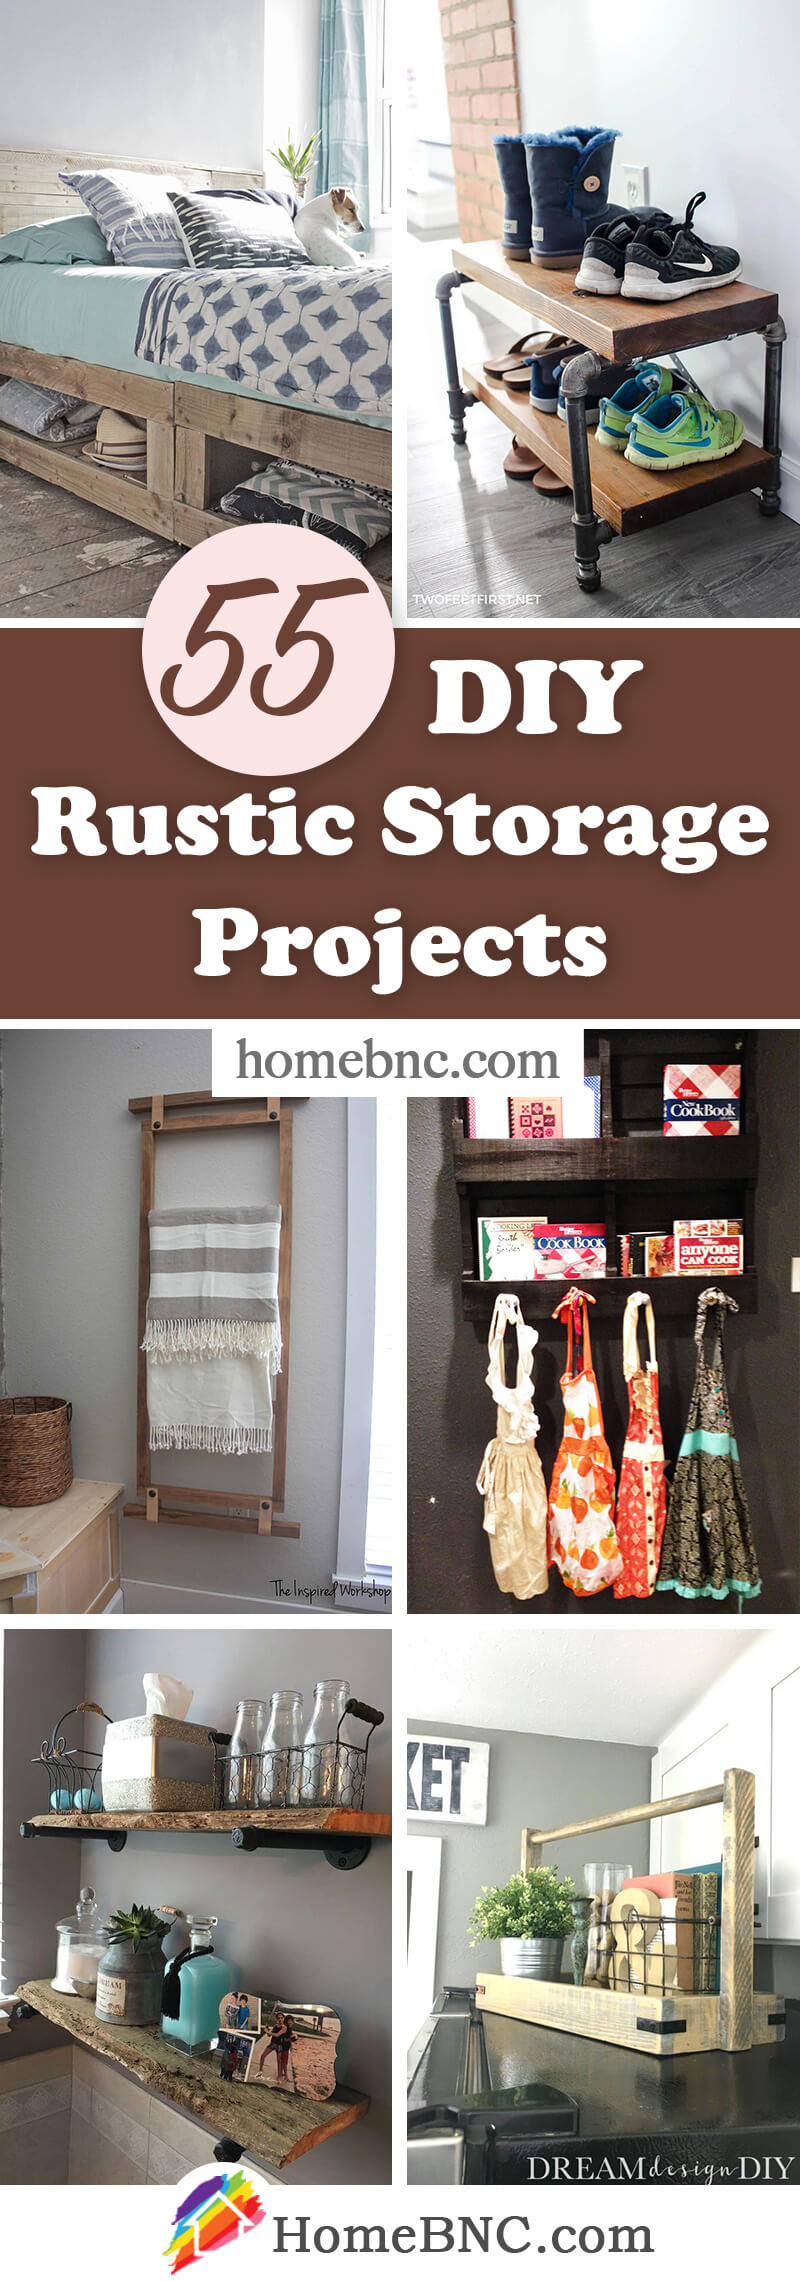 DIY Rustic Storage Projects